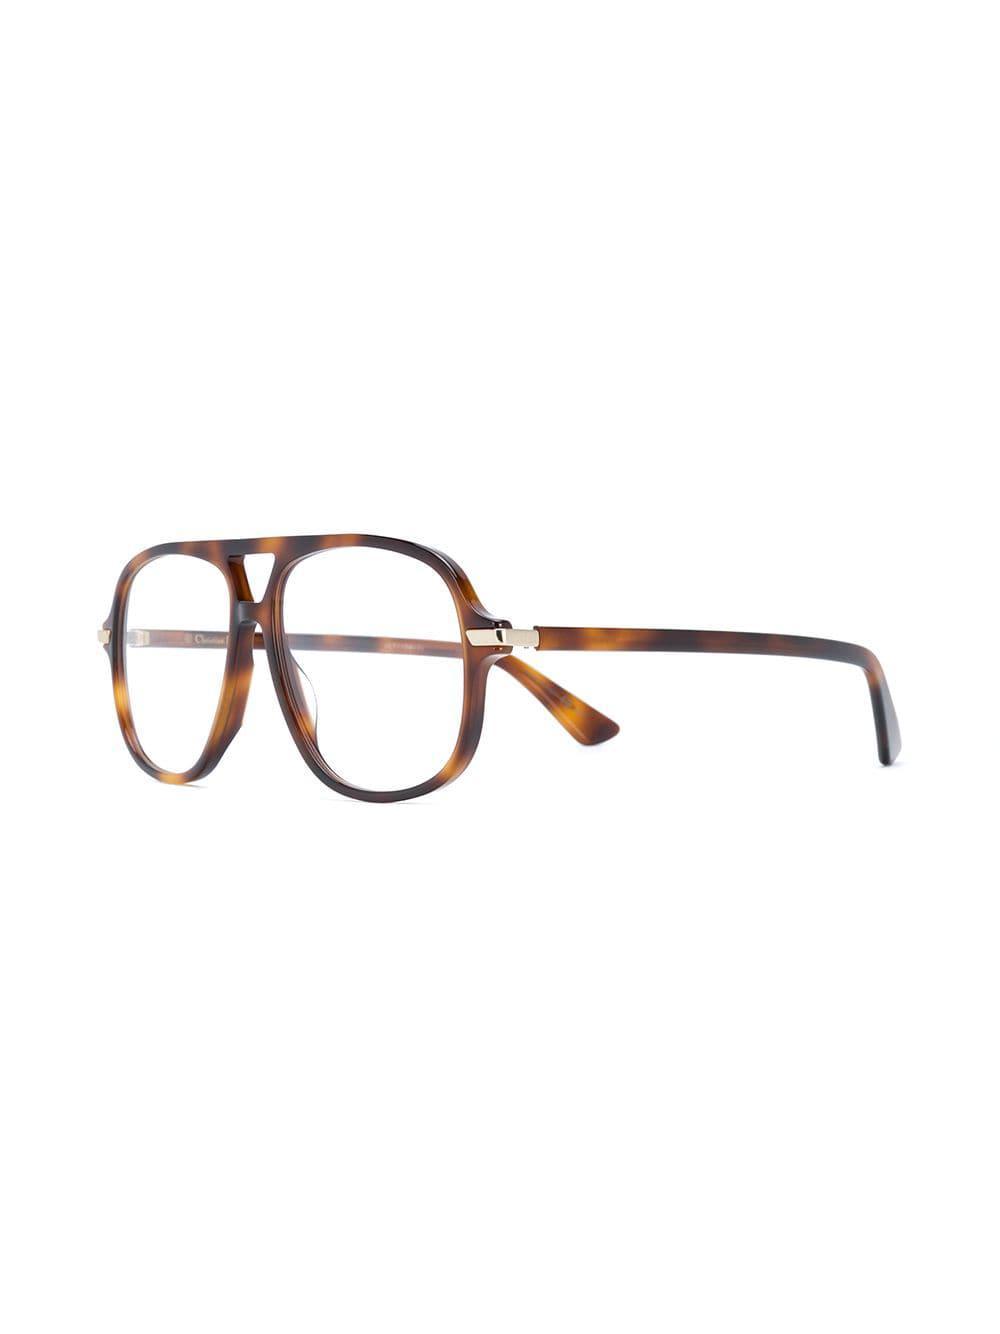 3c4e8e8d270 Dior - Brown Essence Tortoiseshell-effect Glasses - Lyst. View fullscreen